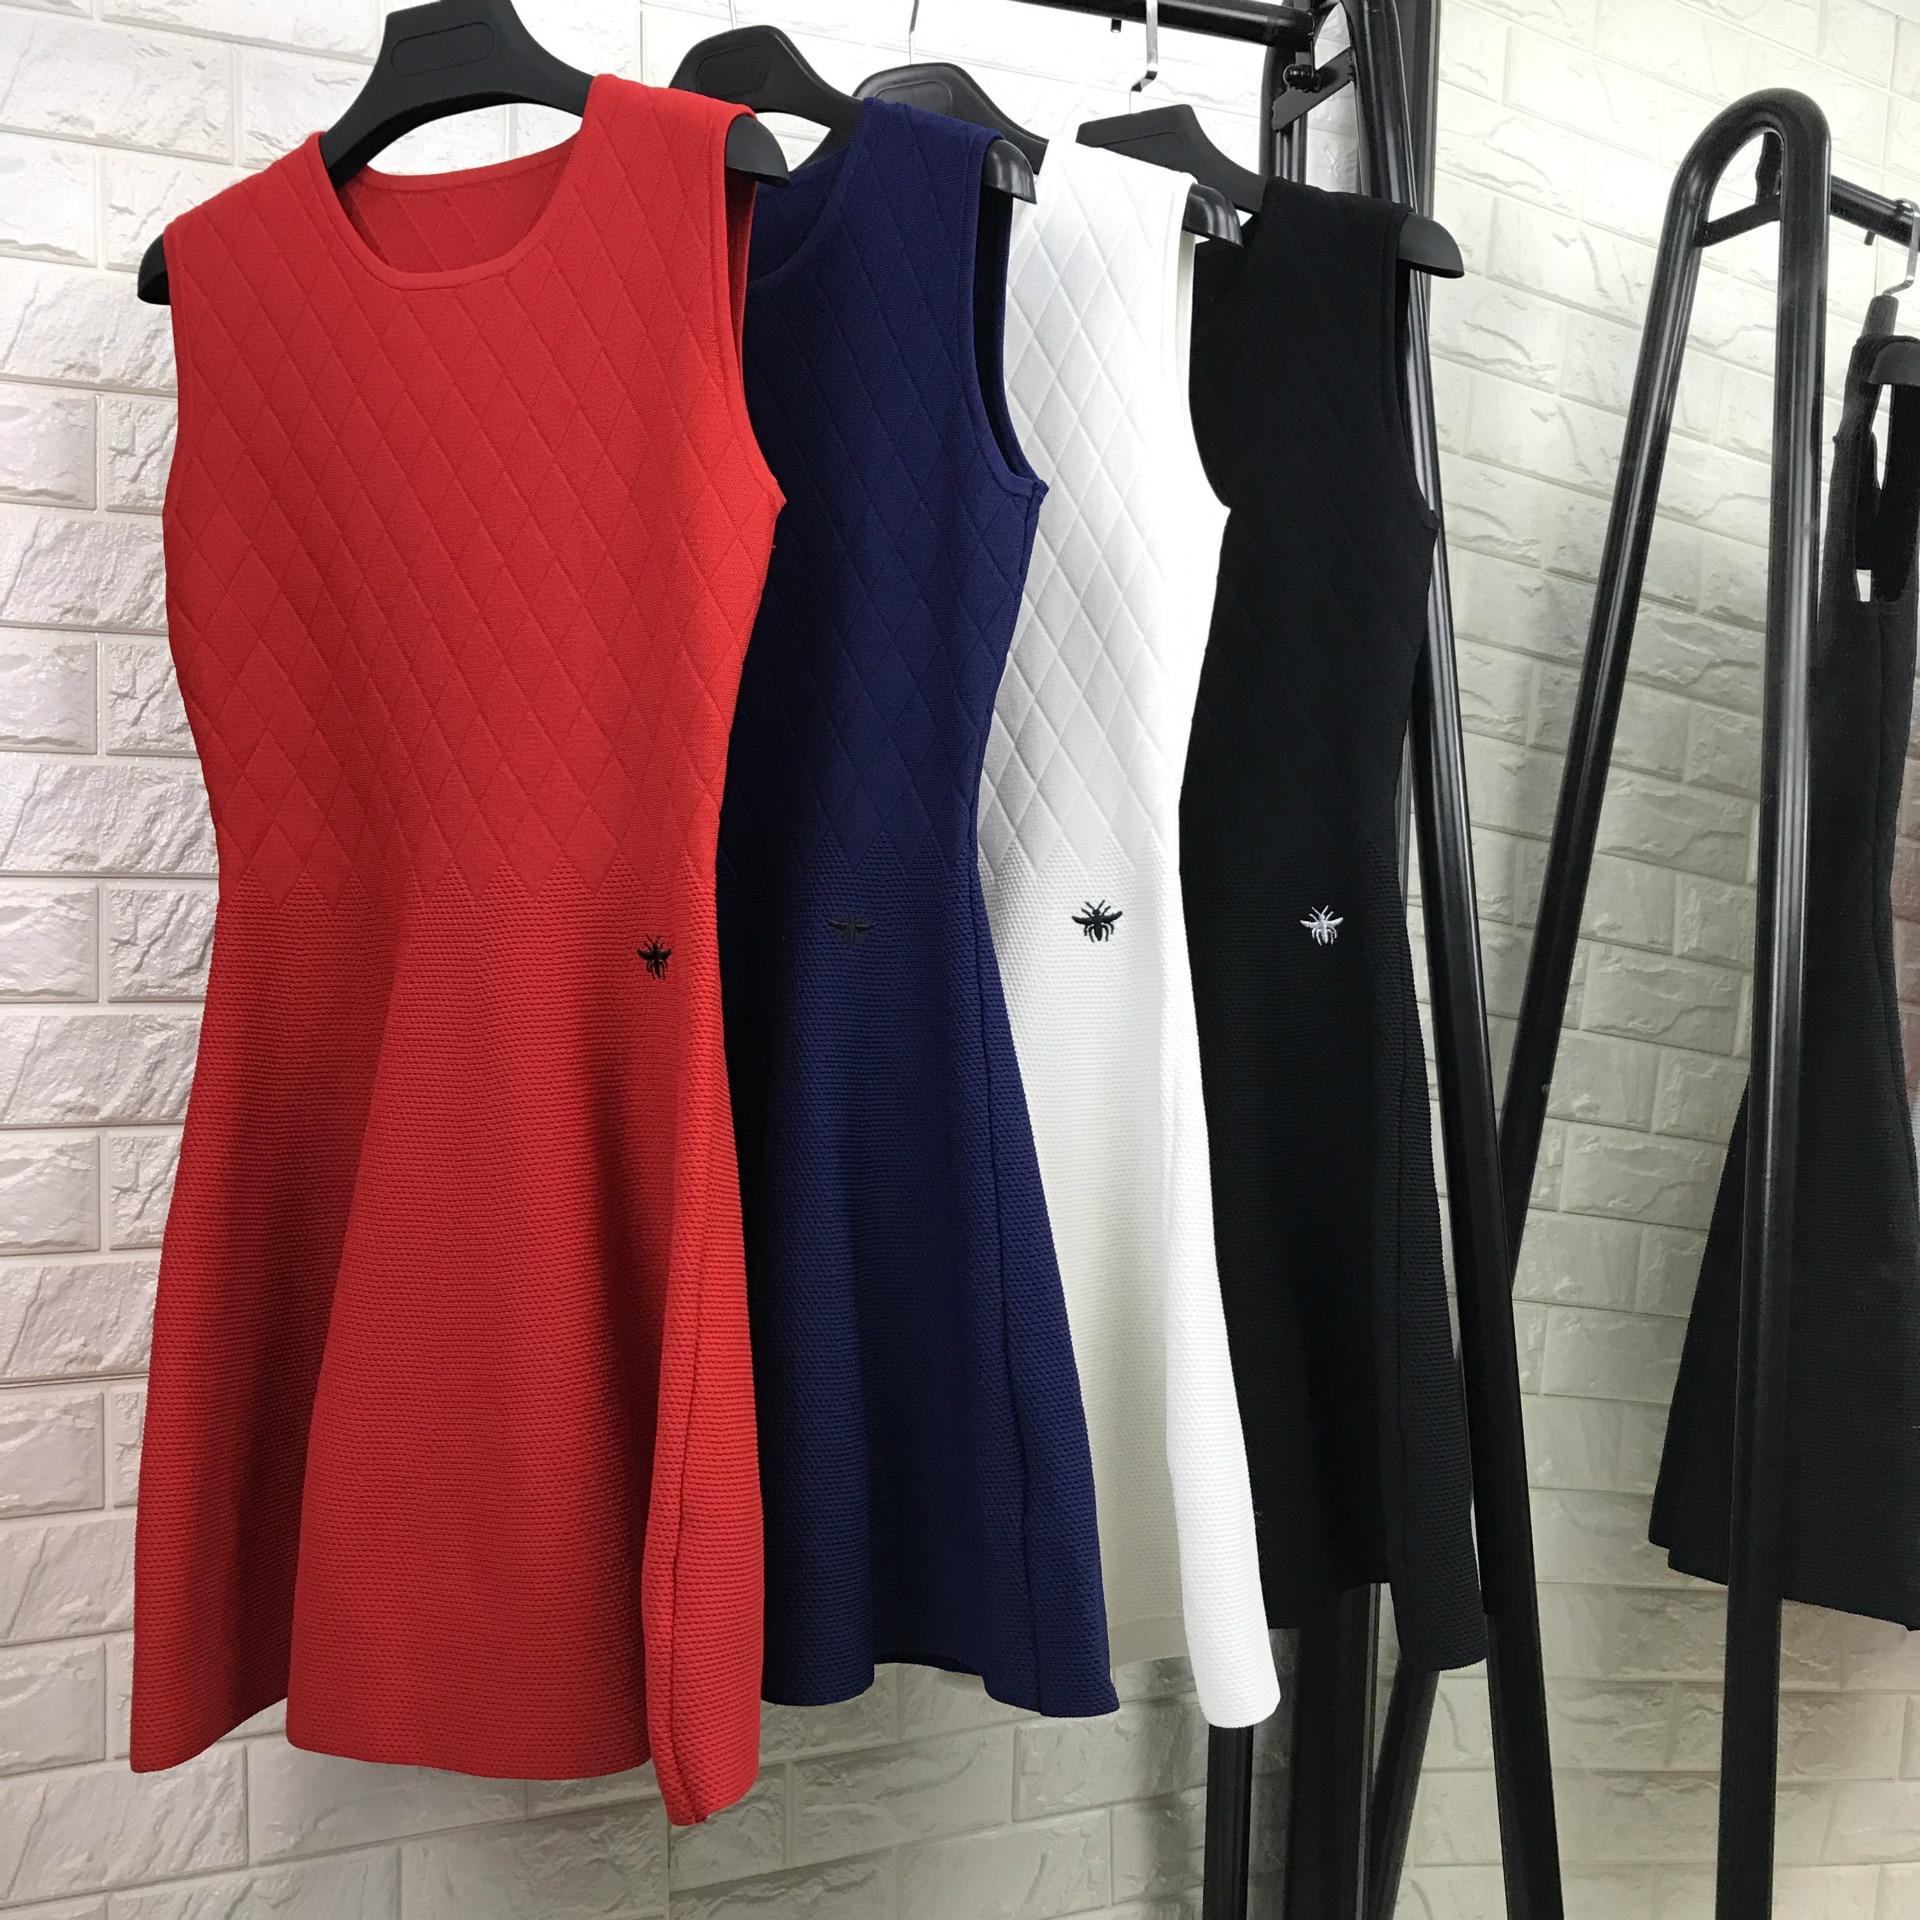 High quality women fashion o-neck knit dress a-line sleeveless brand dresses new 2017 autumn winter red black navy white женское платье dress new brand 2015 o dresses women